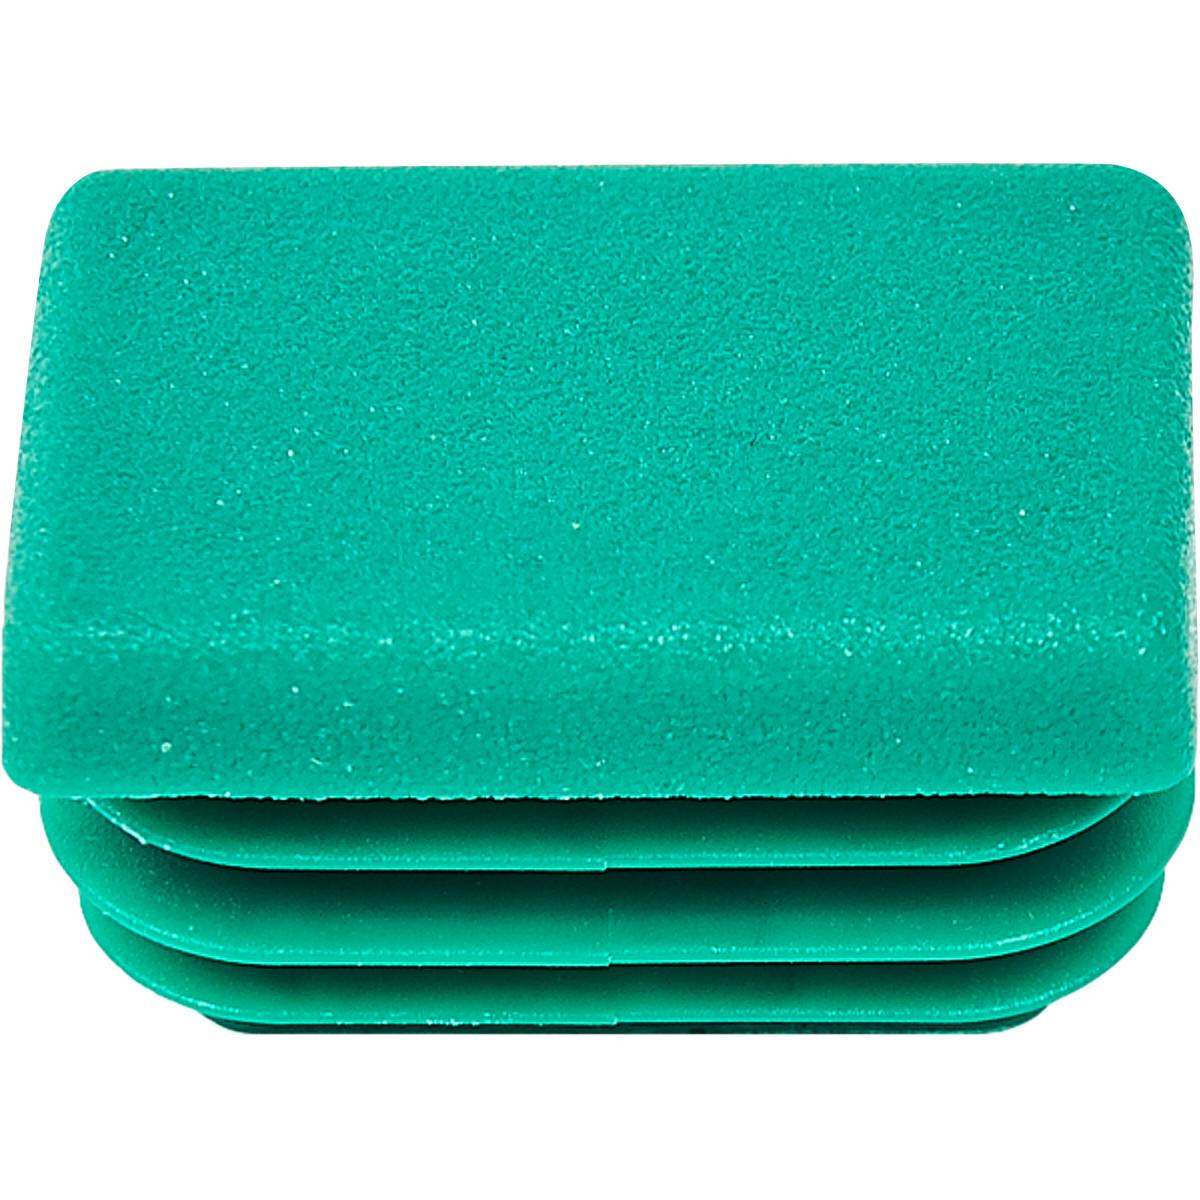 Заглушка профиля Walraven 27x18 мм цвет зеленый